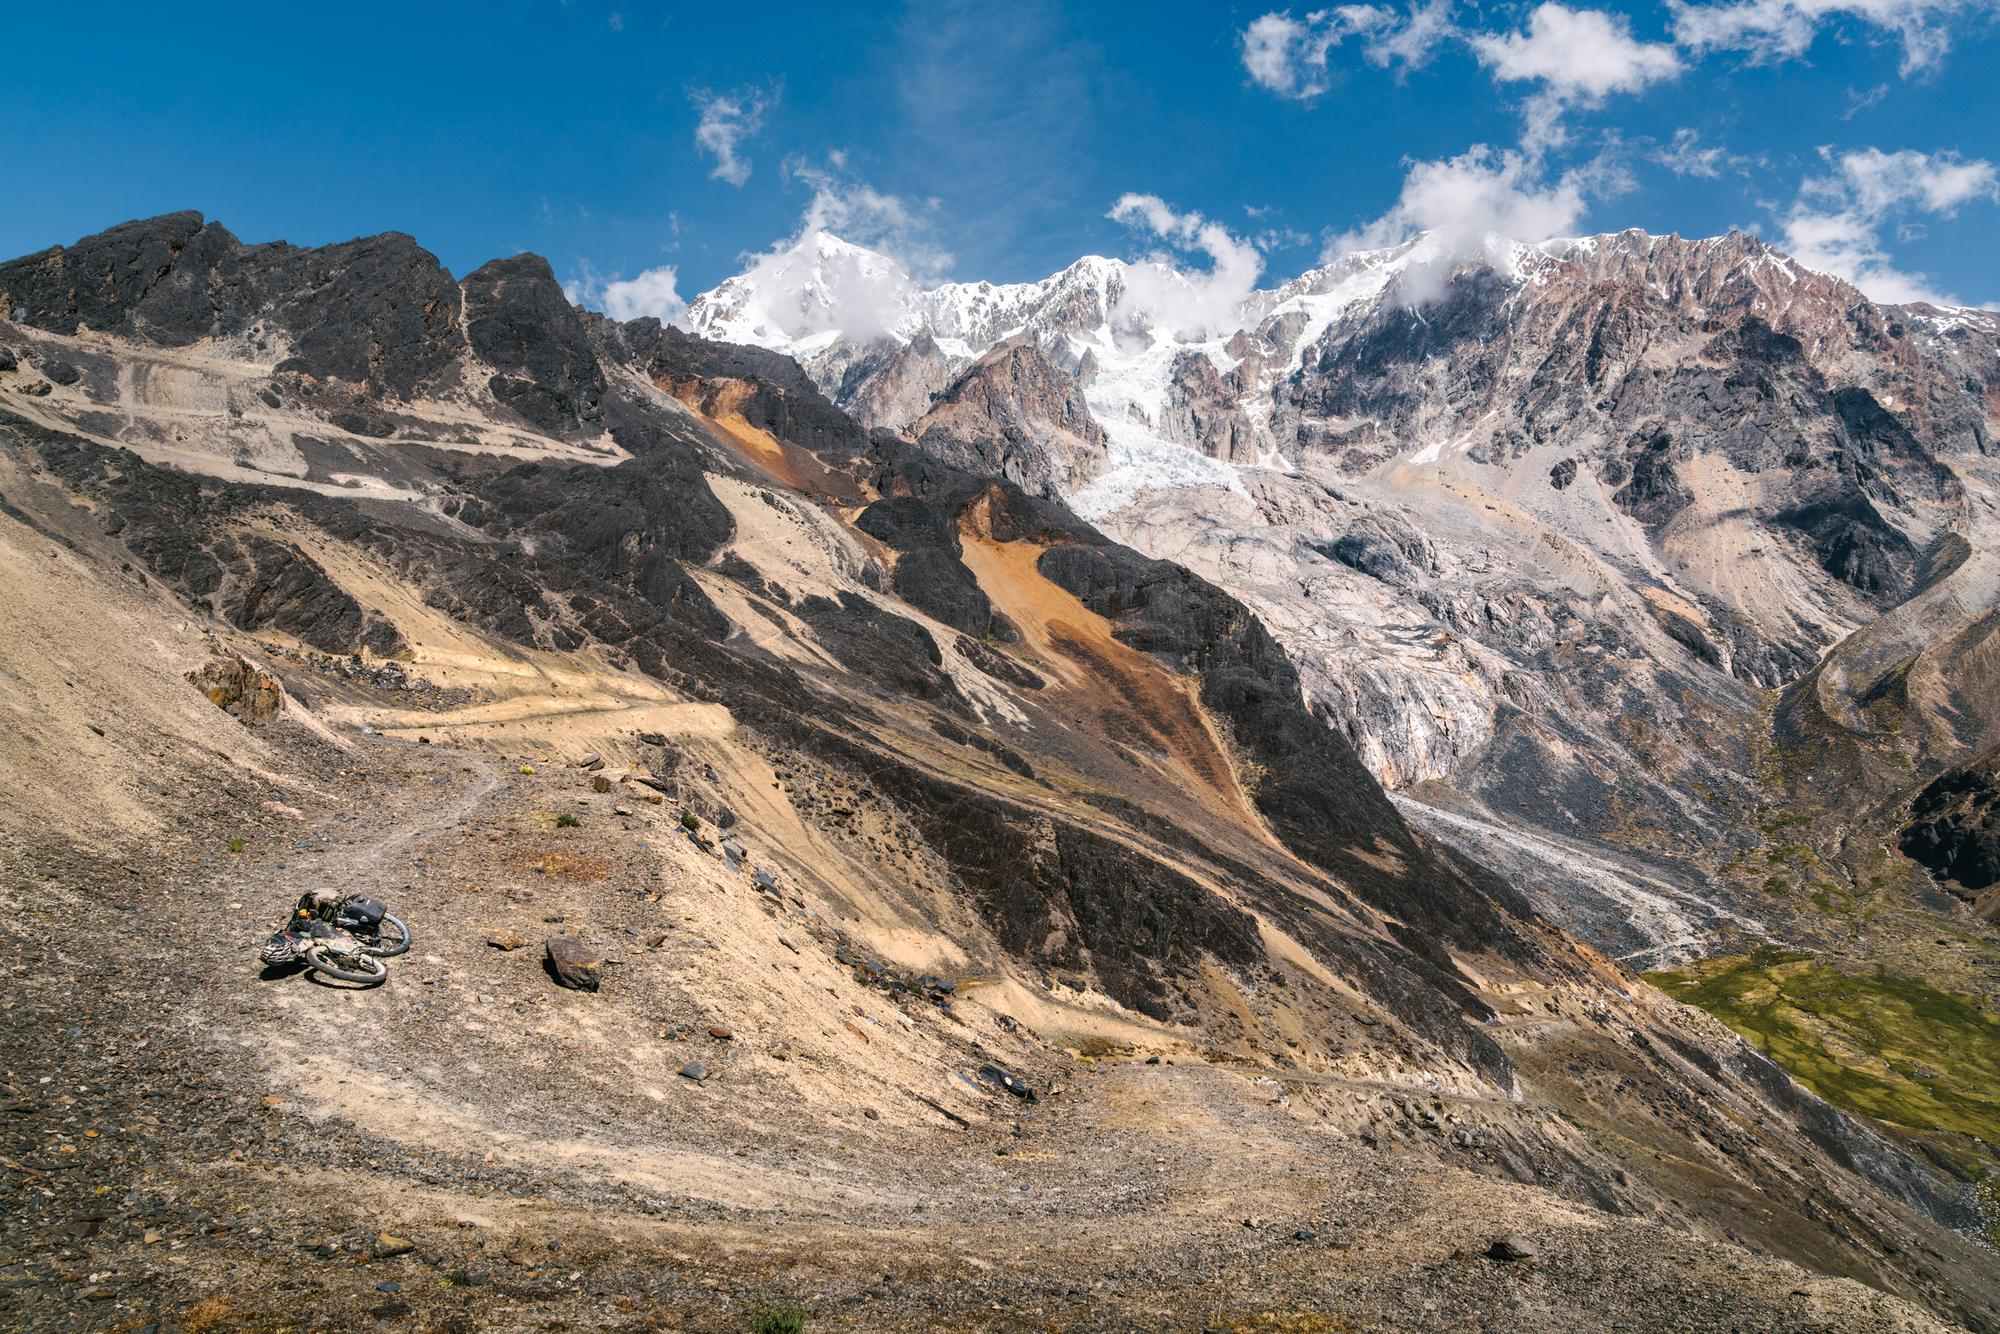 Climbing abandoned mining roads toward Illimani